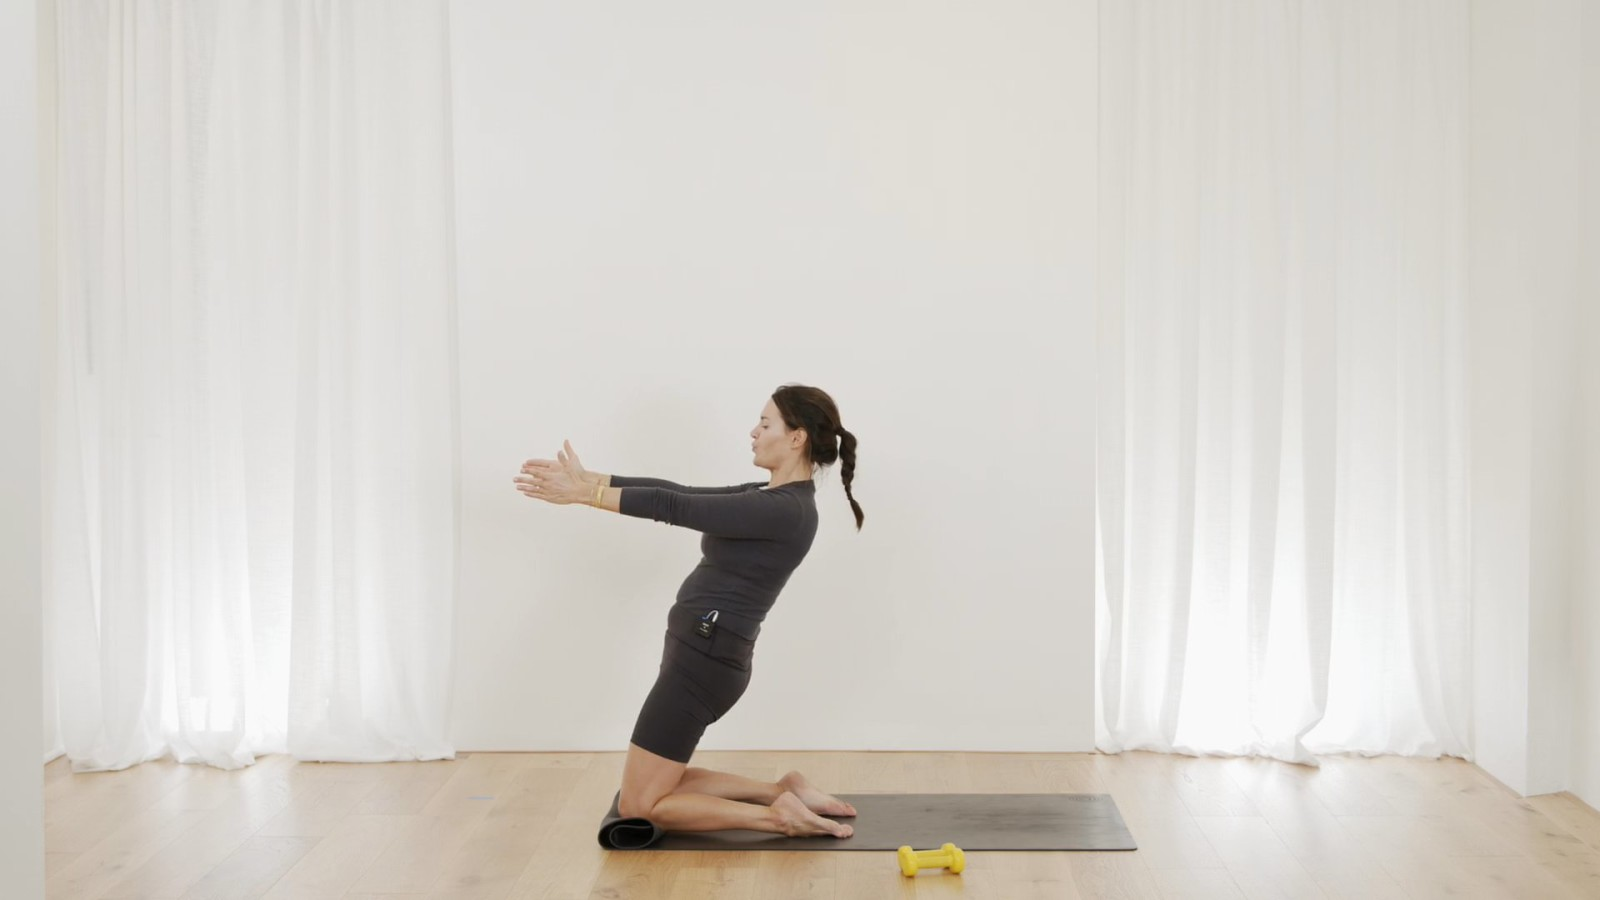 Traditional Pilates moves using dumbbells with Aneta Bachanova